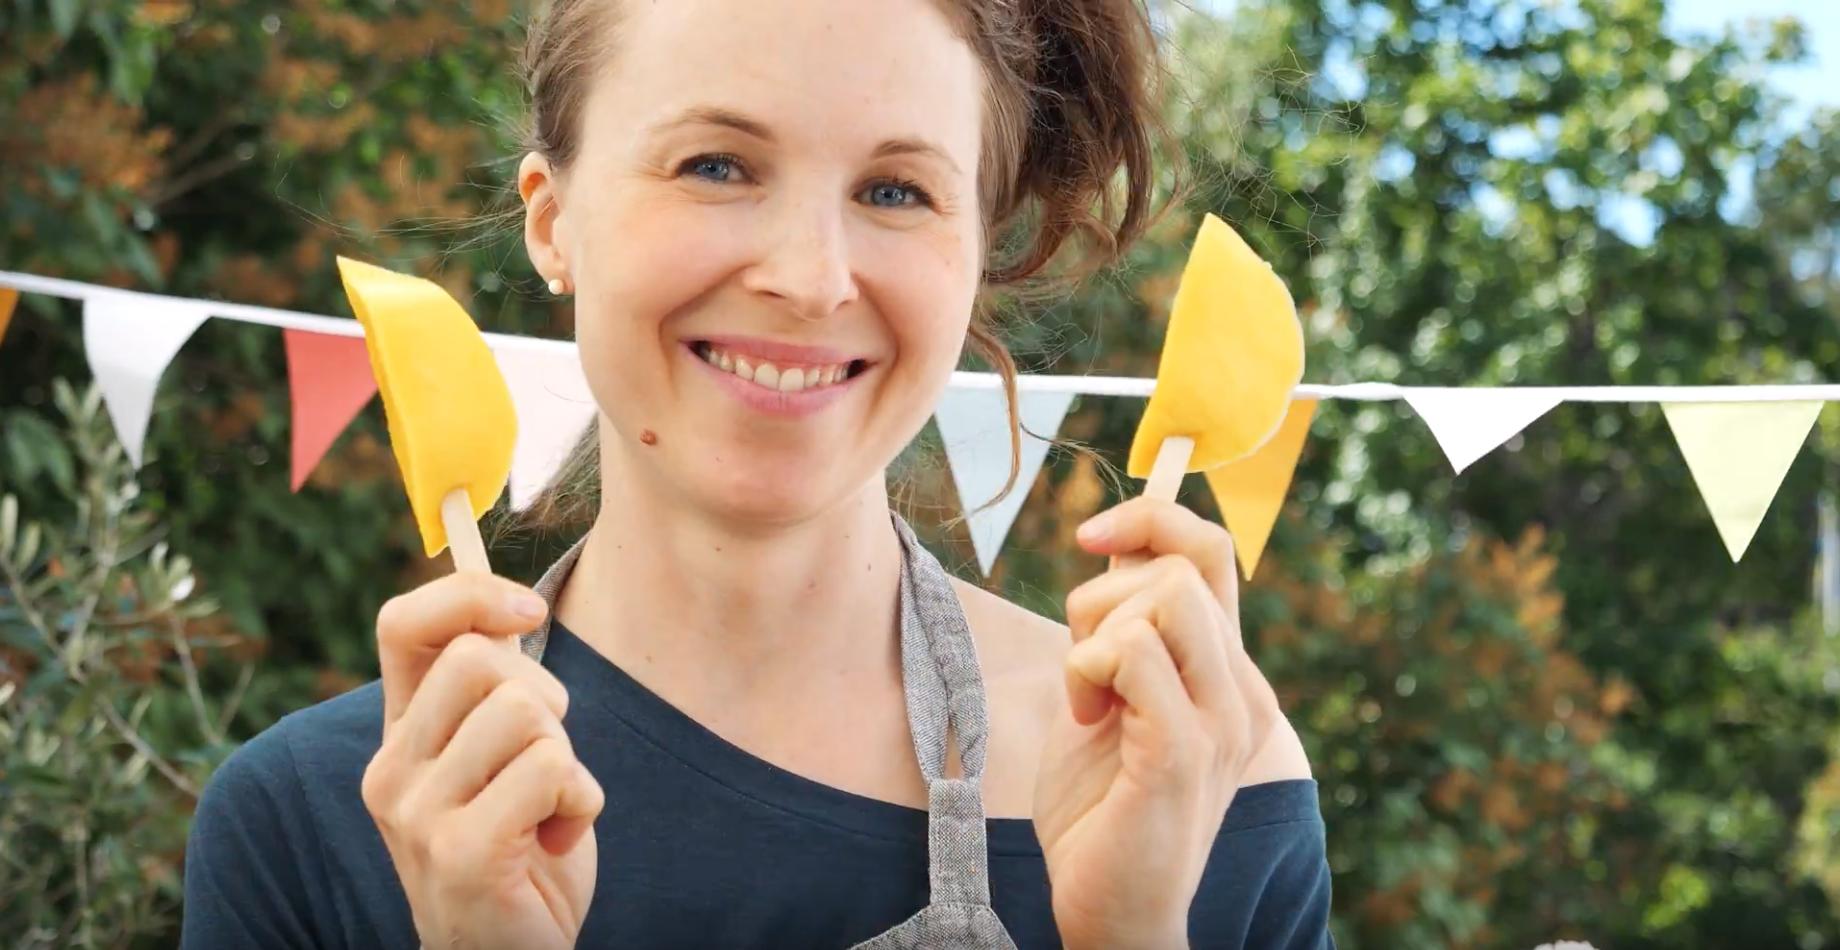 Video: Mangosticks